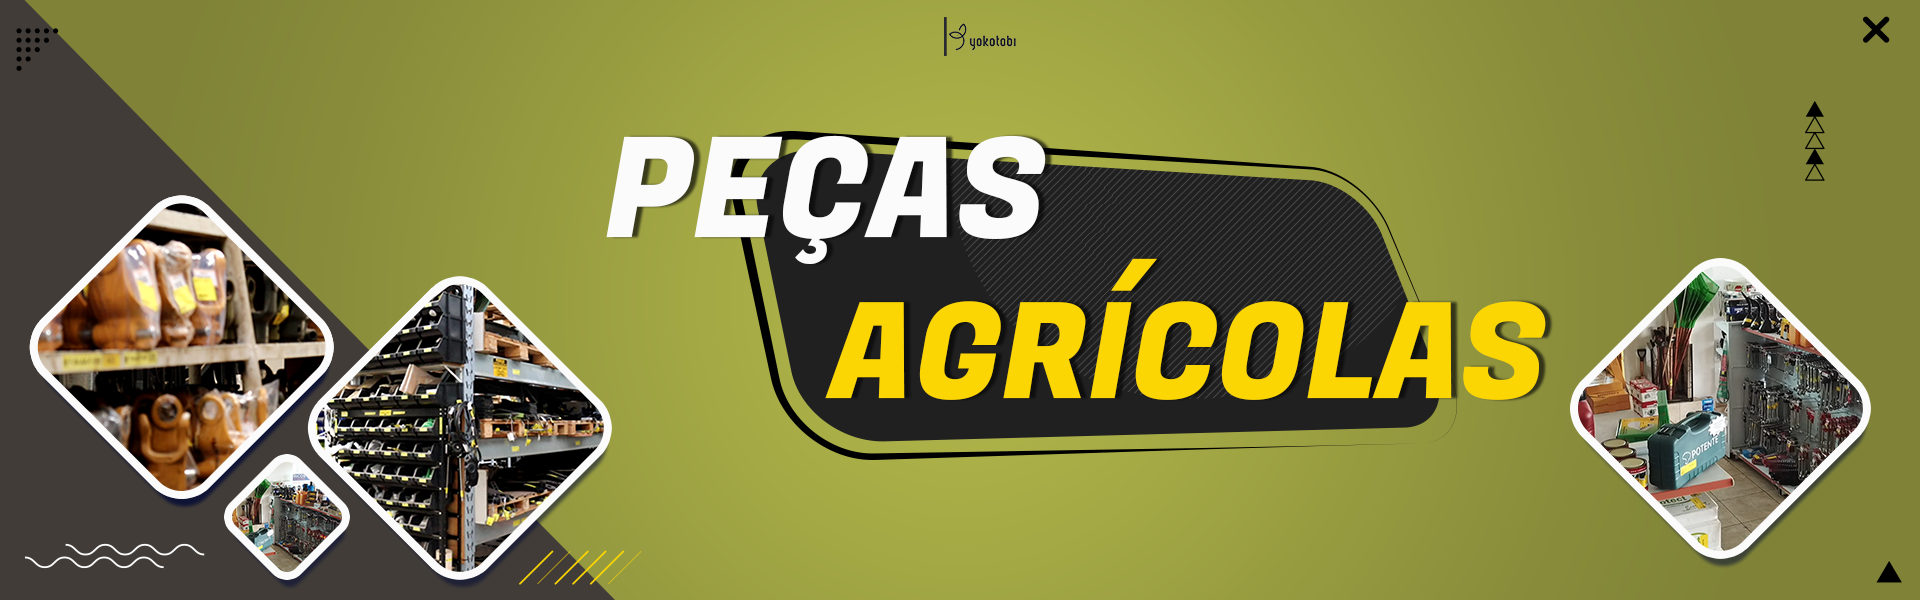 PECAS AGRICOLAS